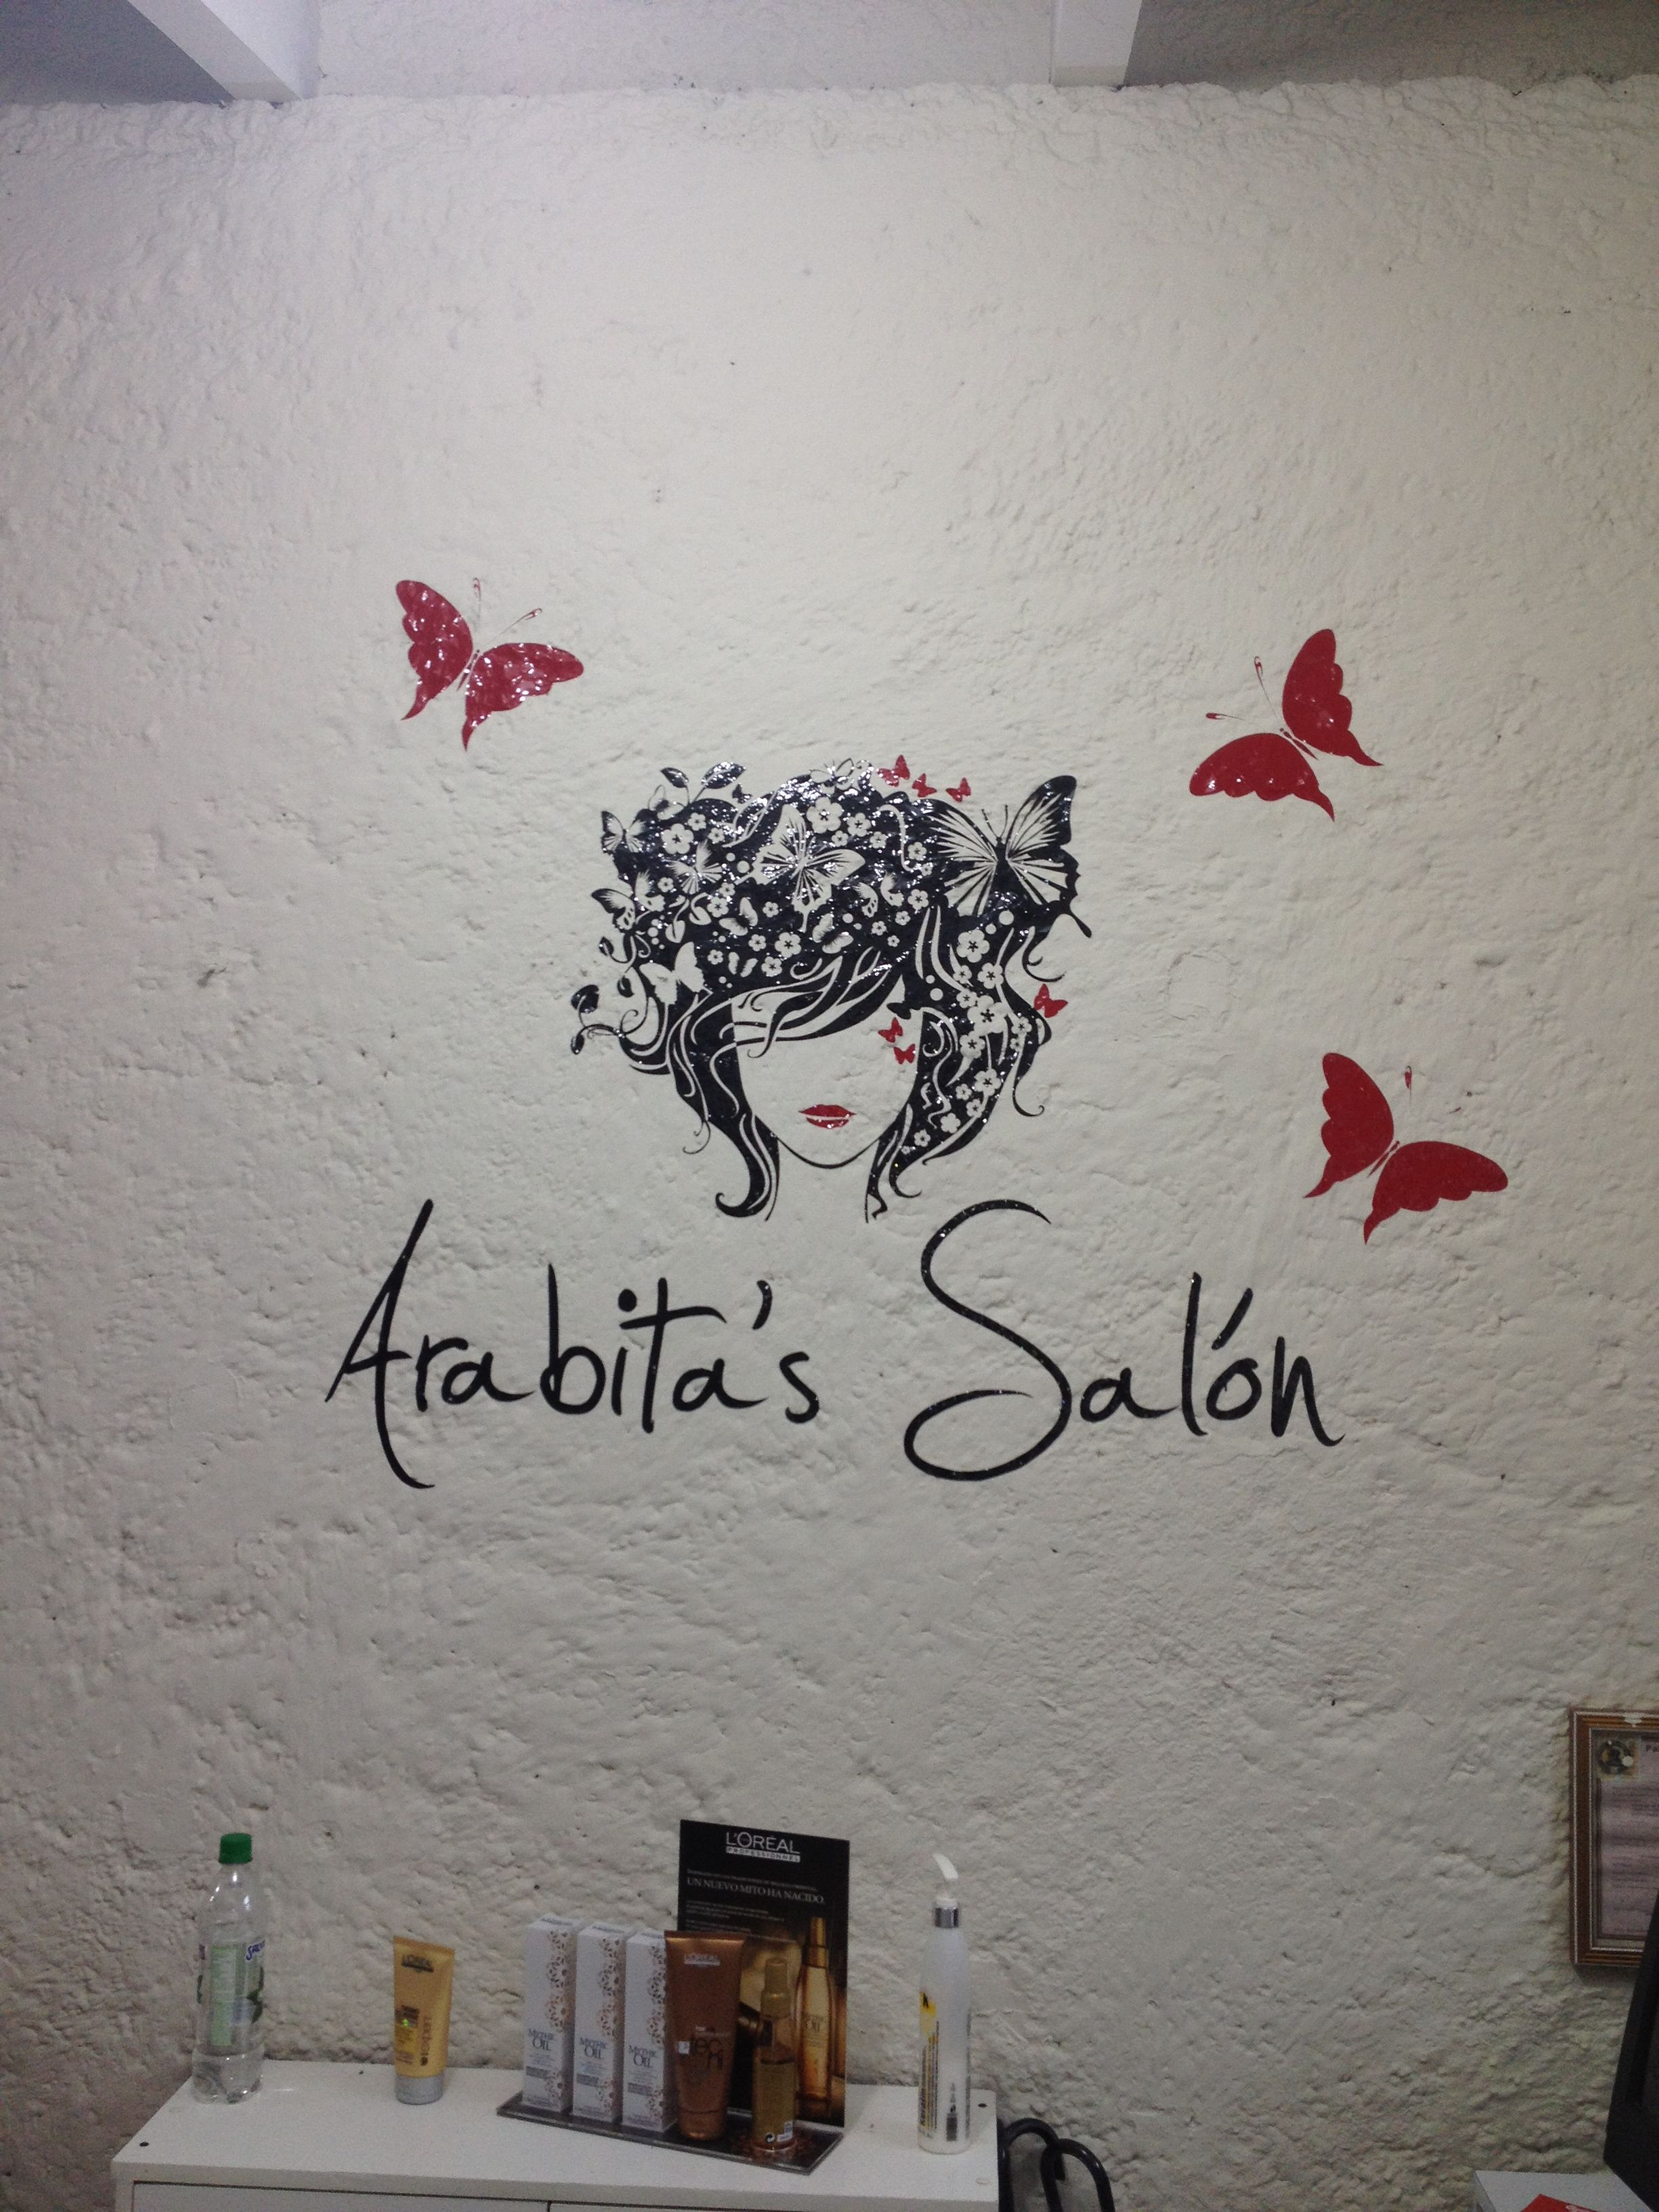 Vinilos Salon De Belleza Stilos De Salones Pinterest Belleza - Decoracion-vinilos-salon